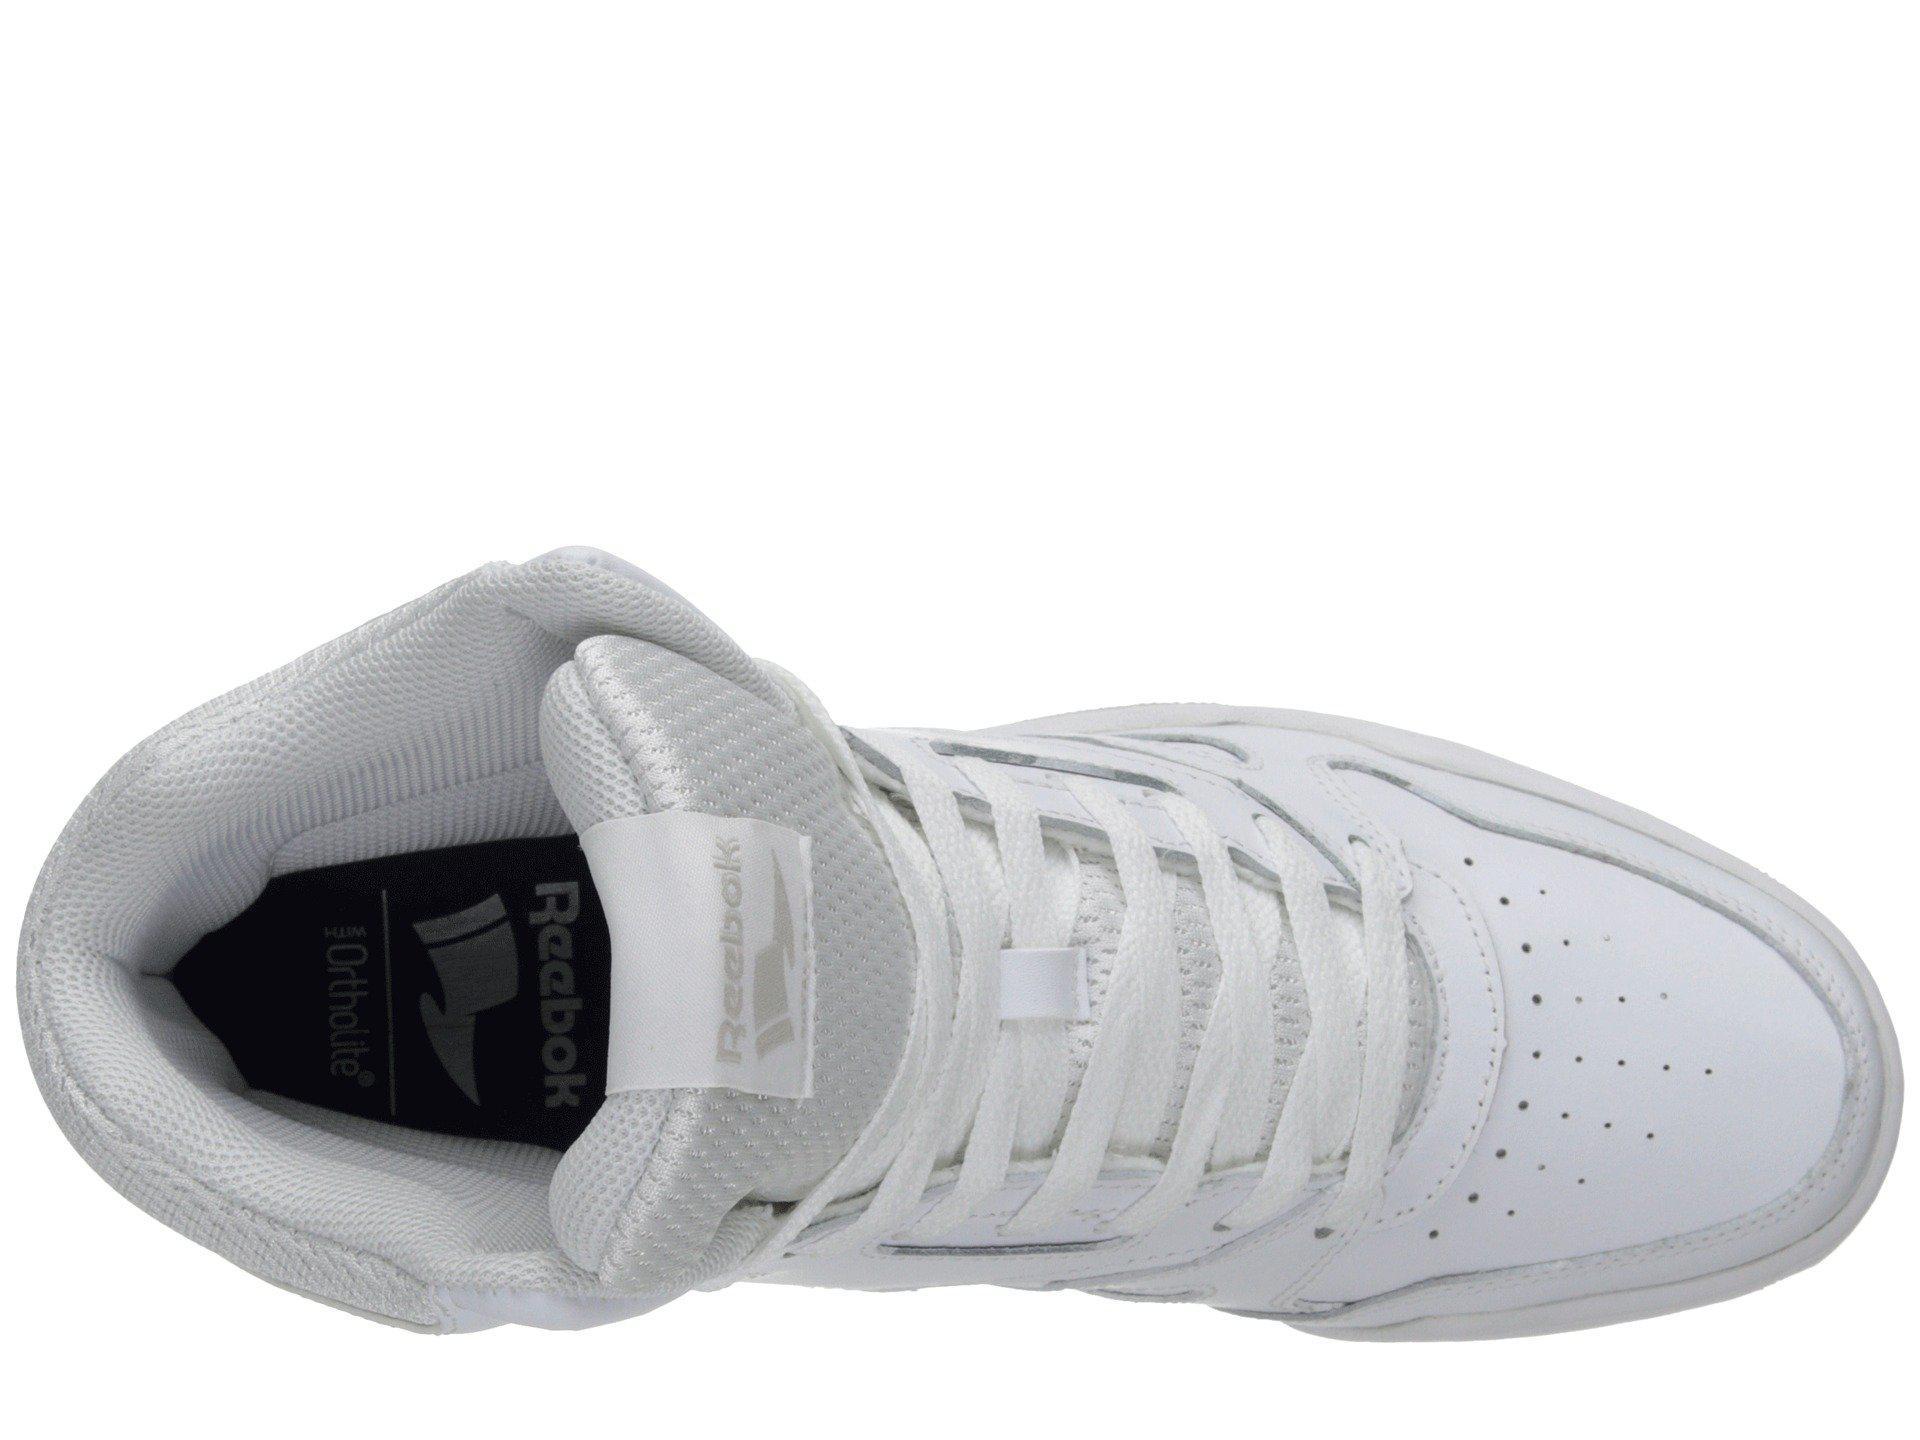 2ab05d60e7e915 Reebok - Multicolor Royal Bb4500 Hi (black shark) Men s Basketball Shoes  for Men. View fullscreen